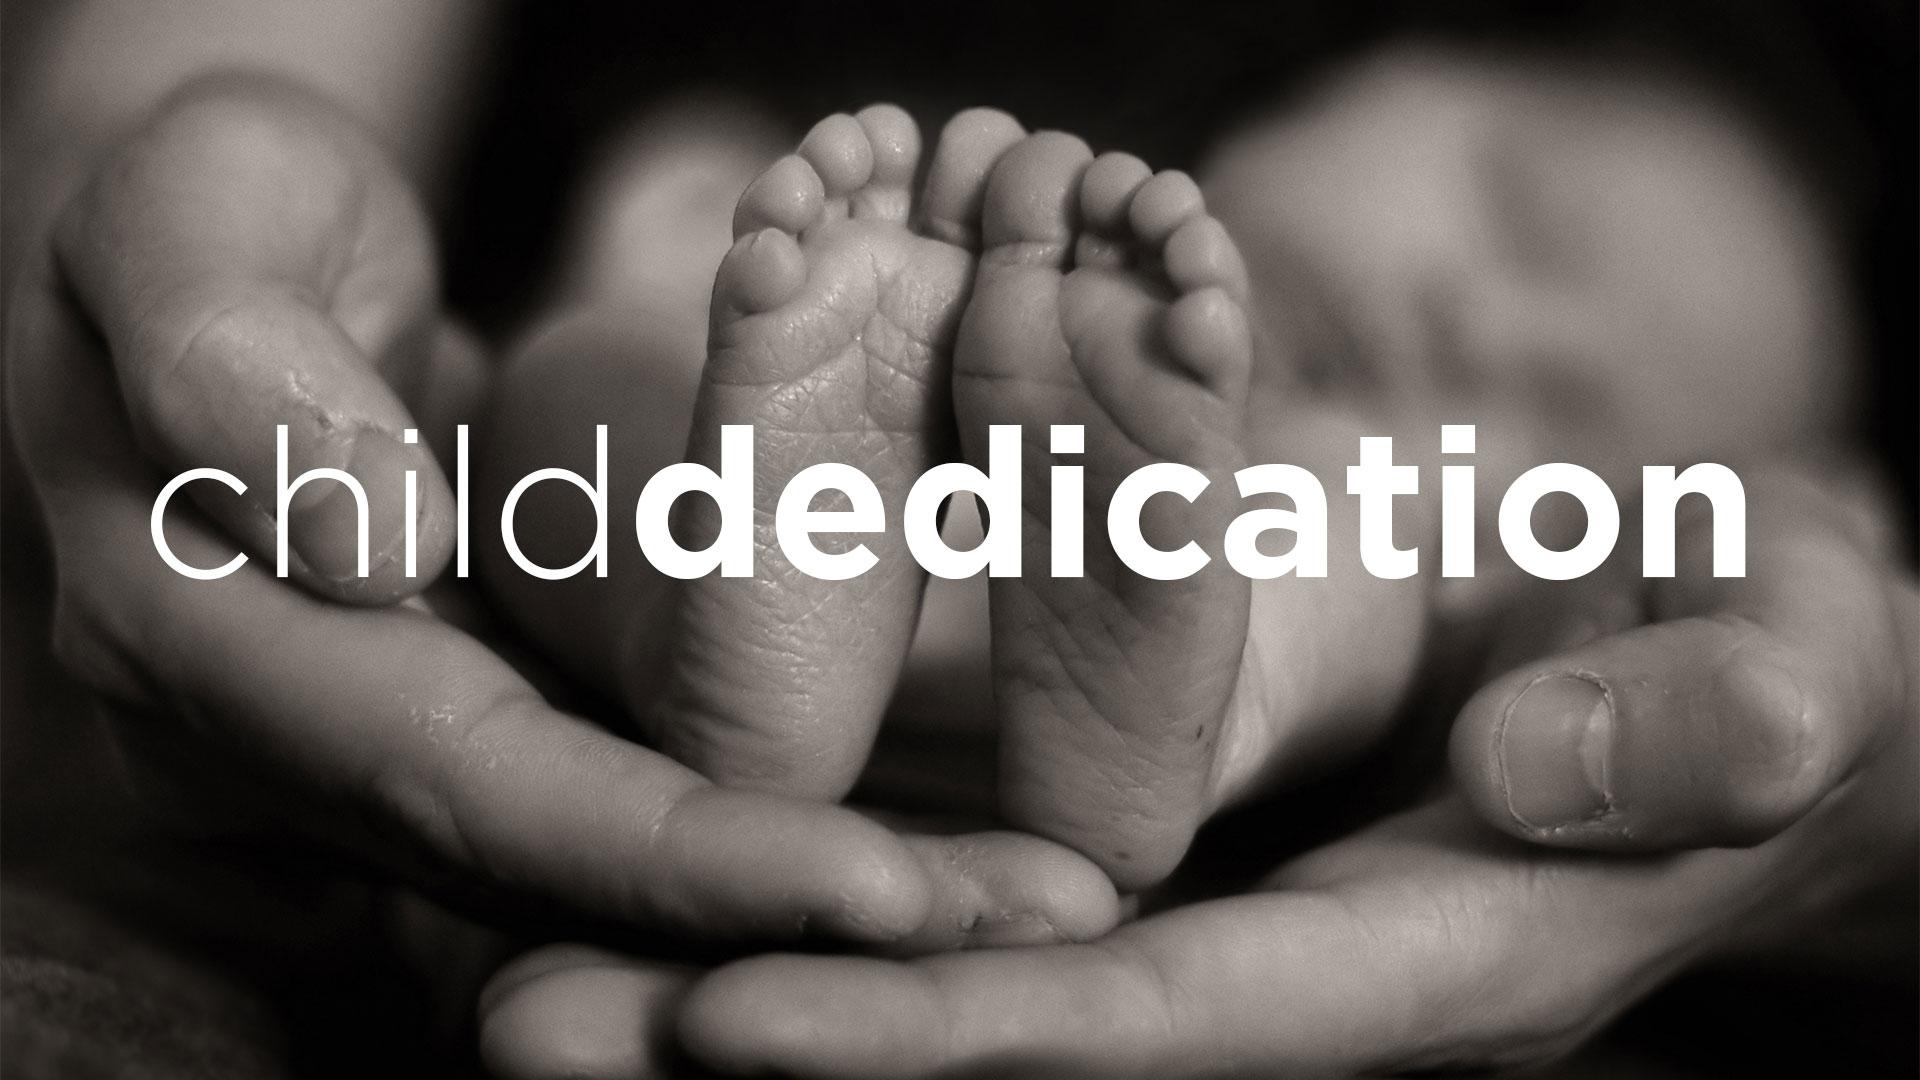 Child dedication wide